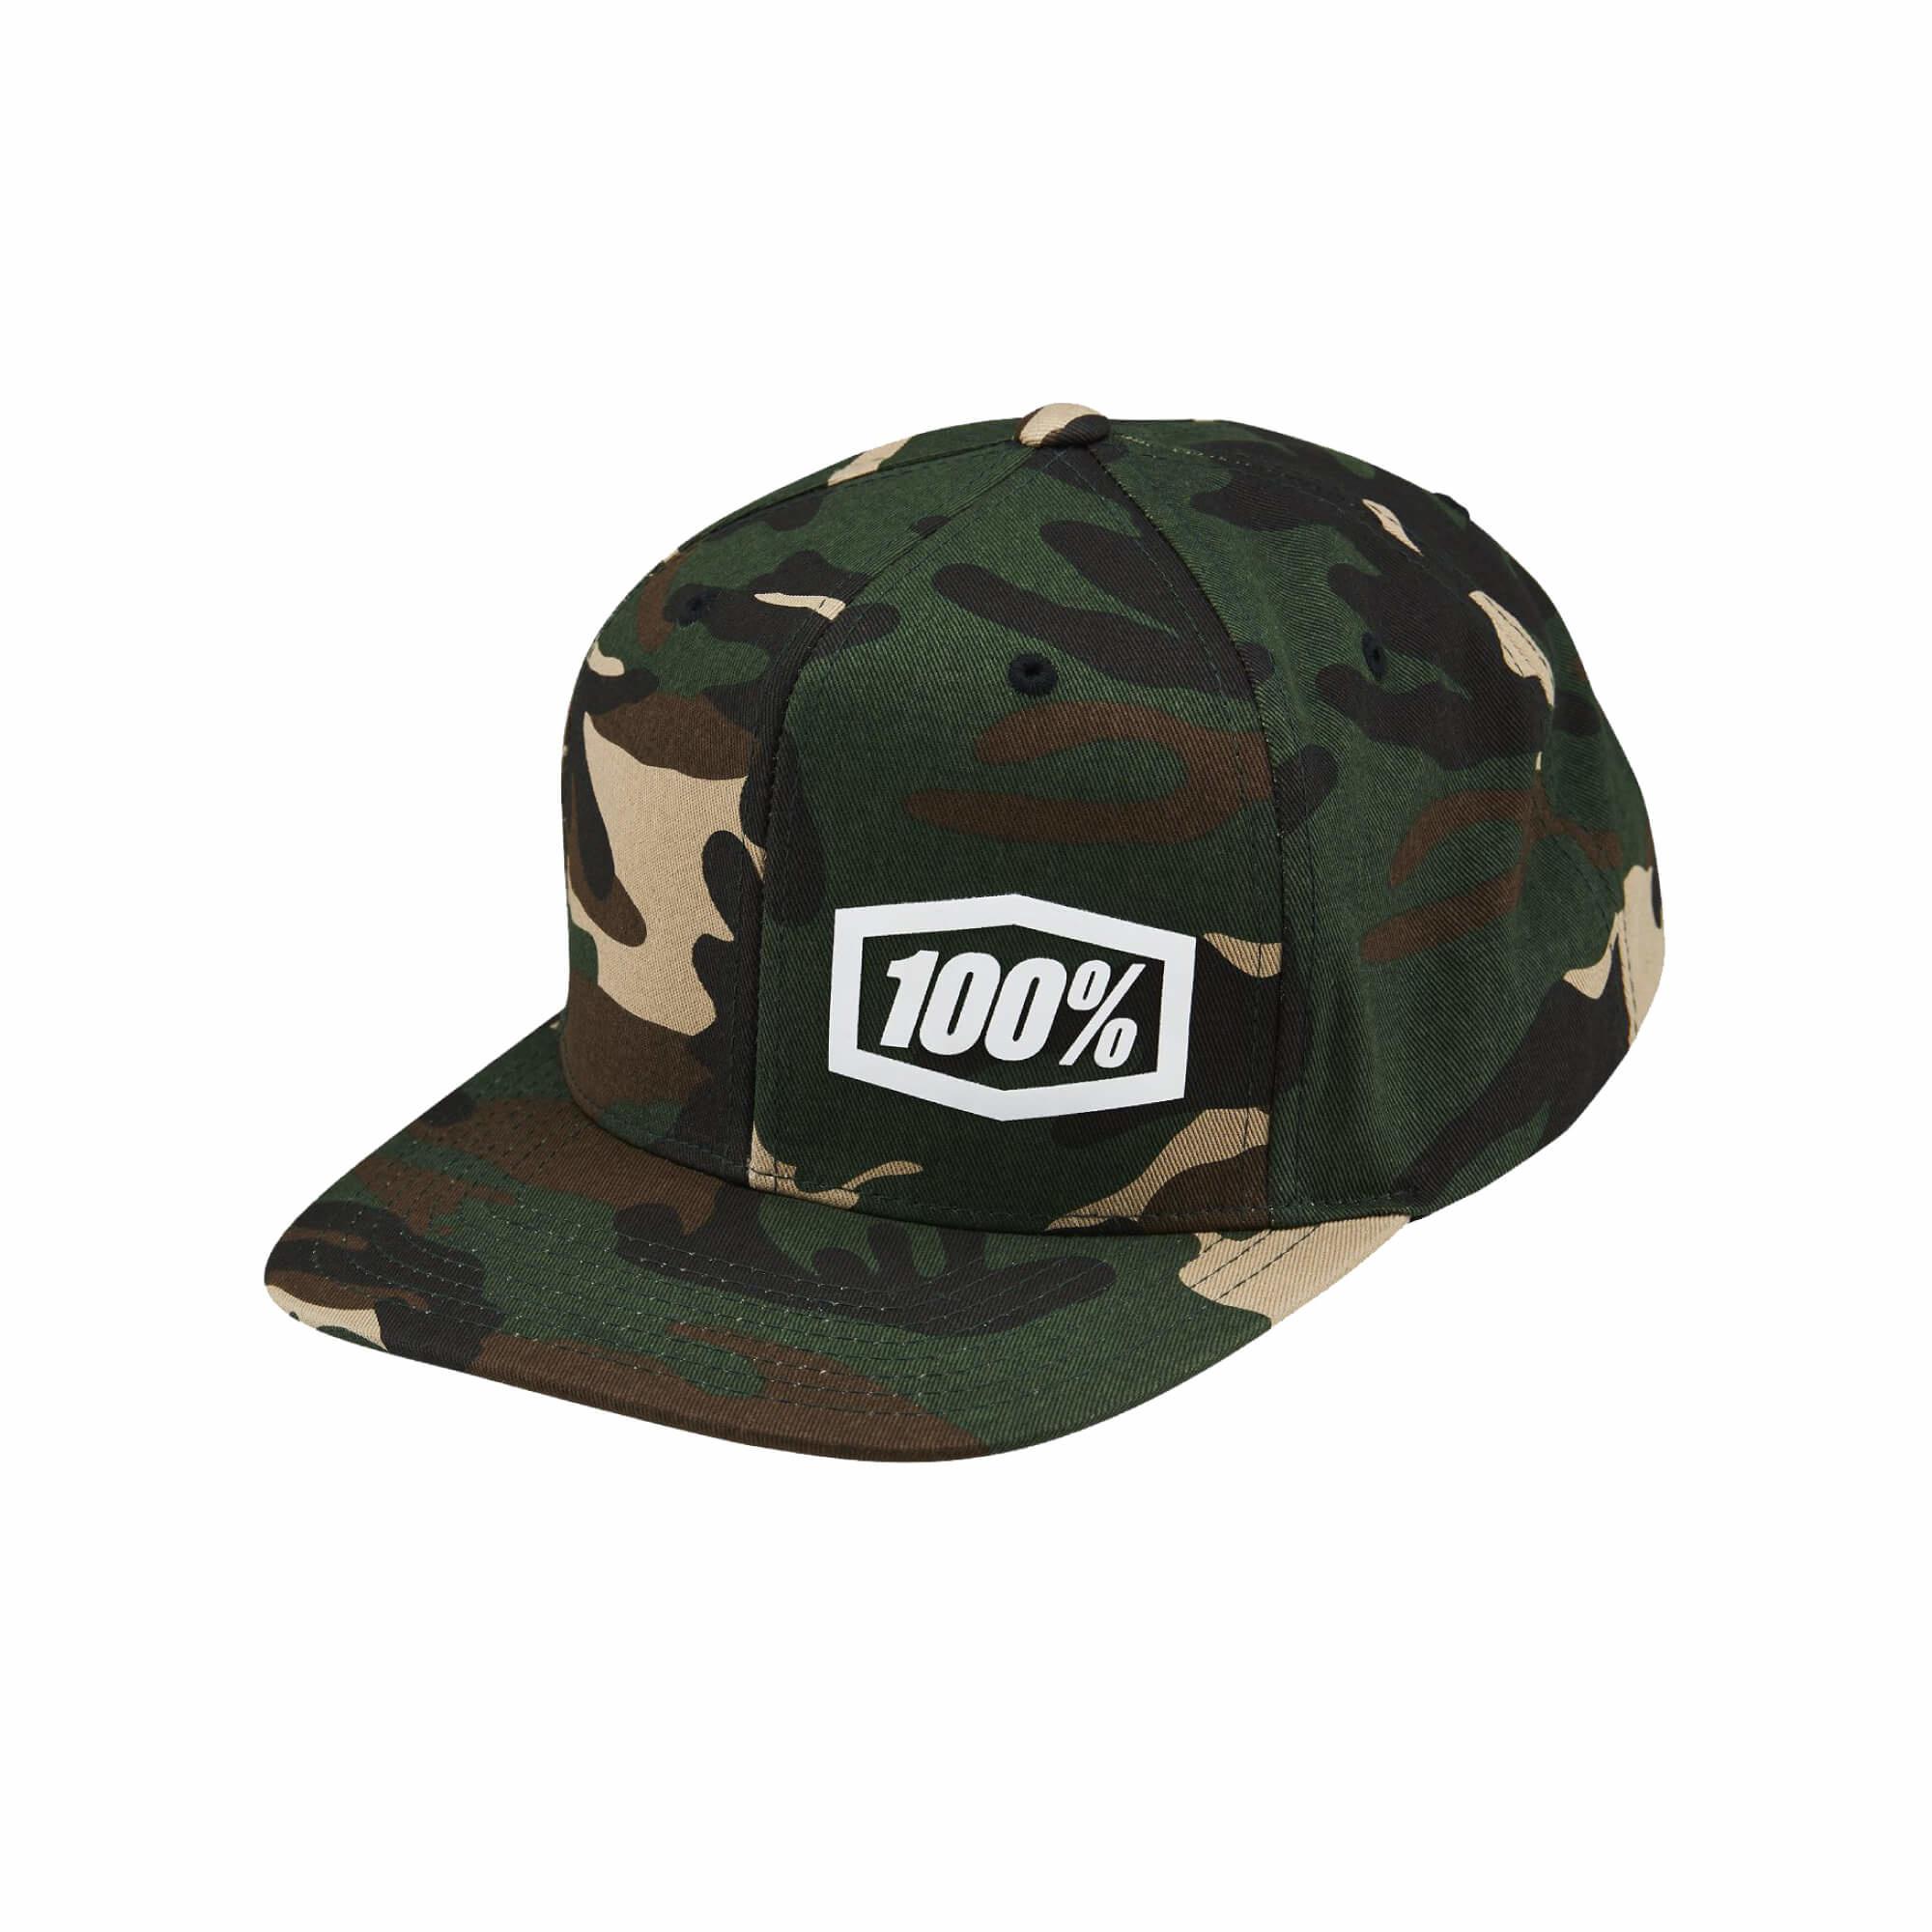 Machine Snapback Hat Camo-1